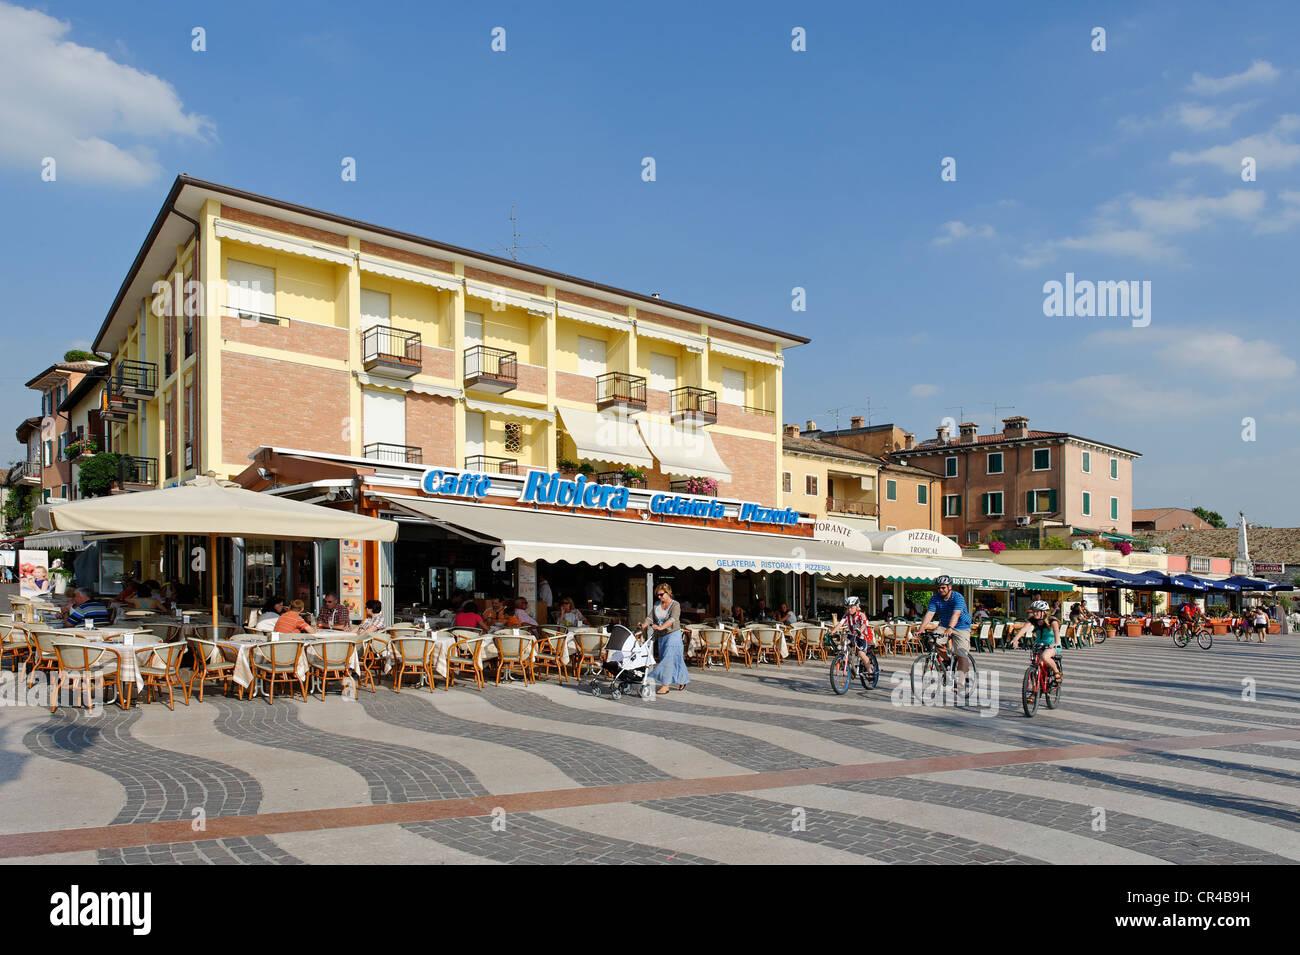 Bars und Eisdielen auf der Uferpromenade promenade in Lazise am Gardasee, Lago di Garda, Venetien, Italien, Europa Stockbild